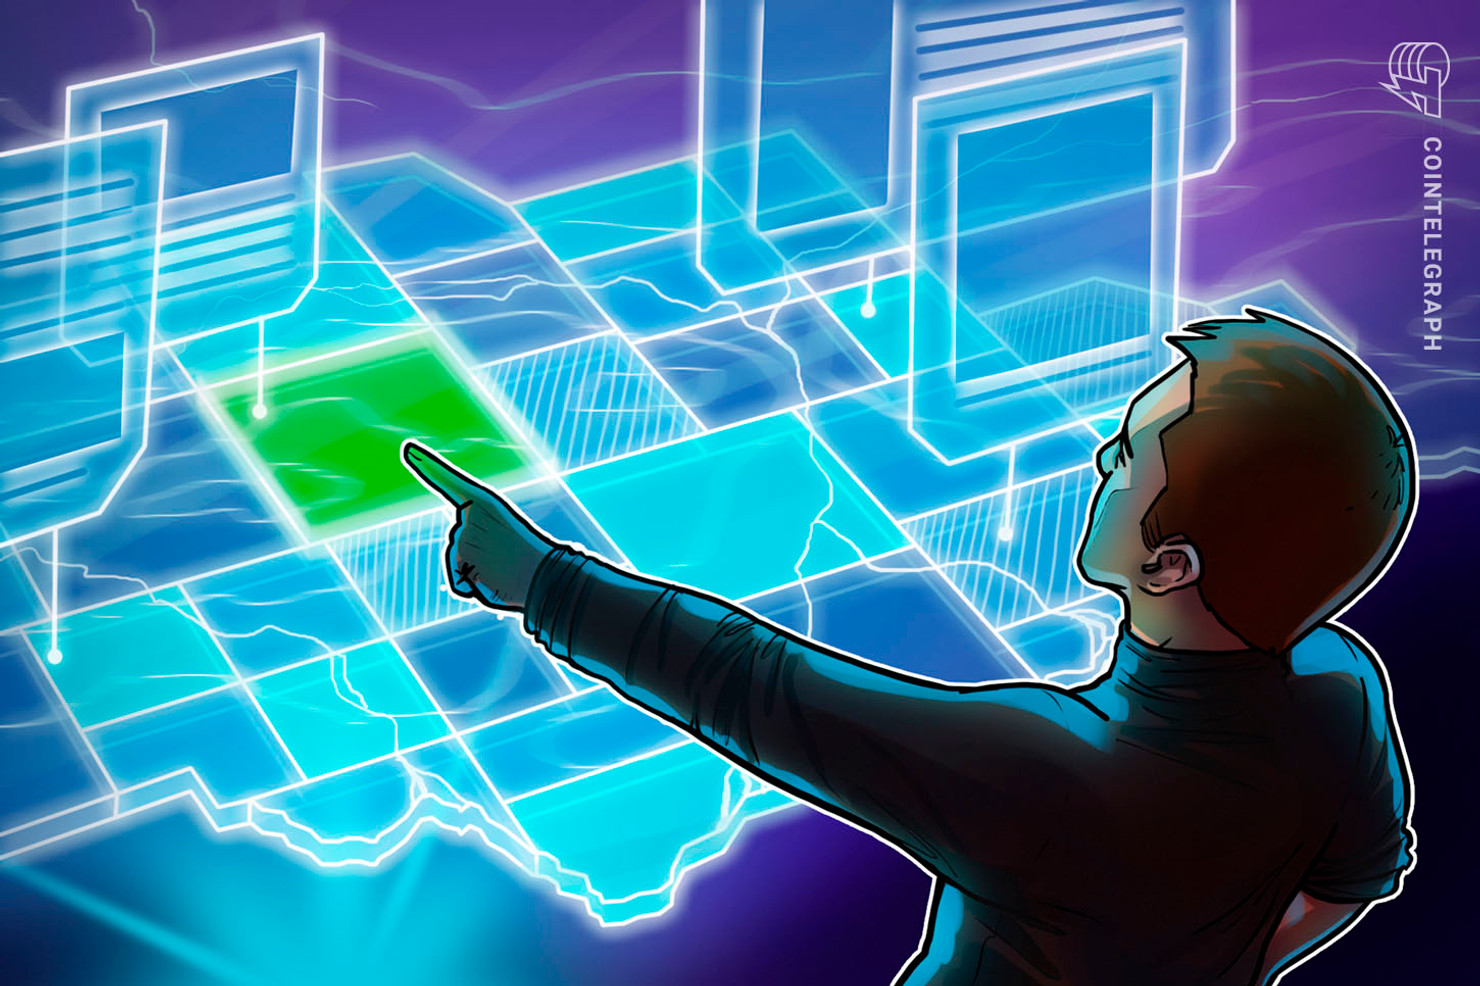 Flying Hot Off the Shelves — Virtual Land Based on Blockchain